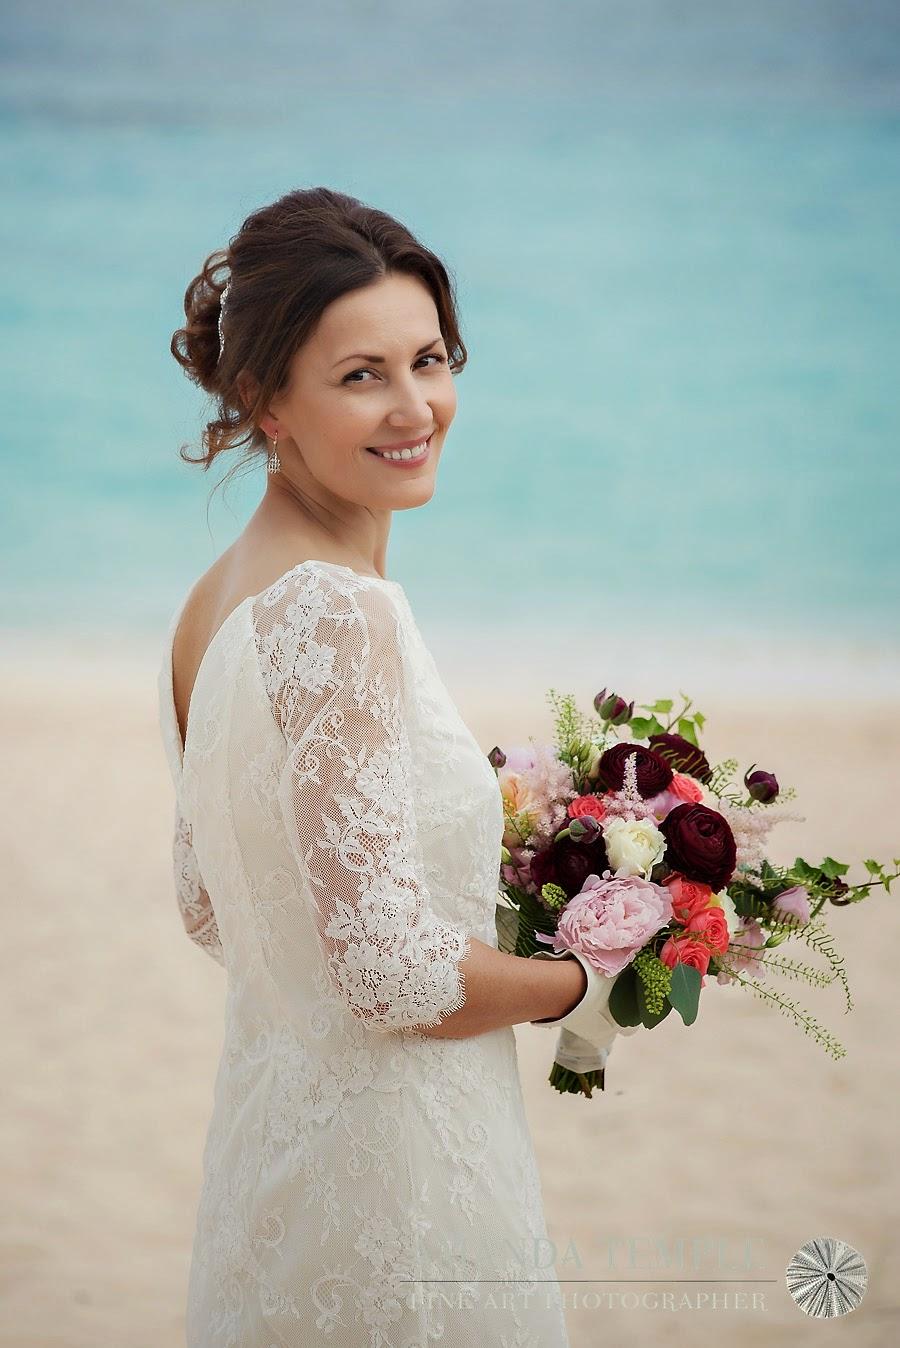 Old Fashioned Wedding Suit Hire Southampton Vignette - Wedding Plan ...